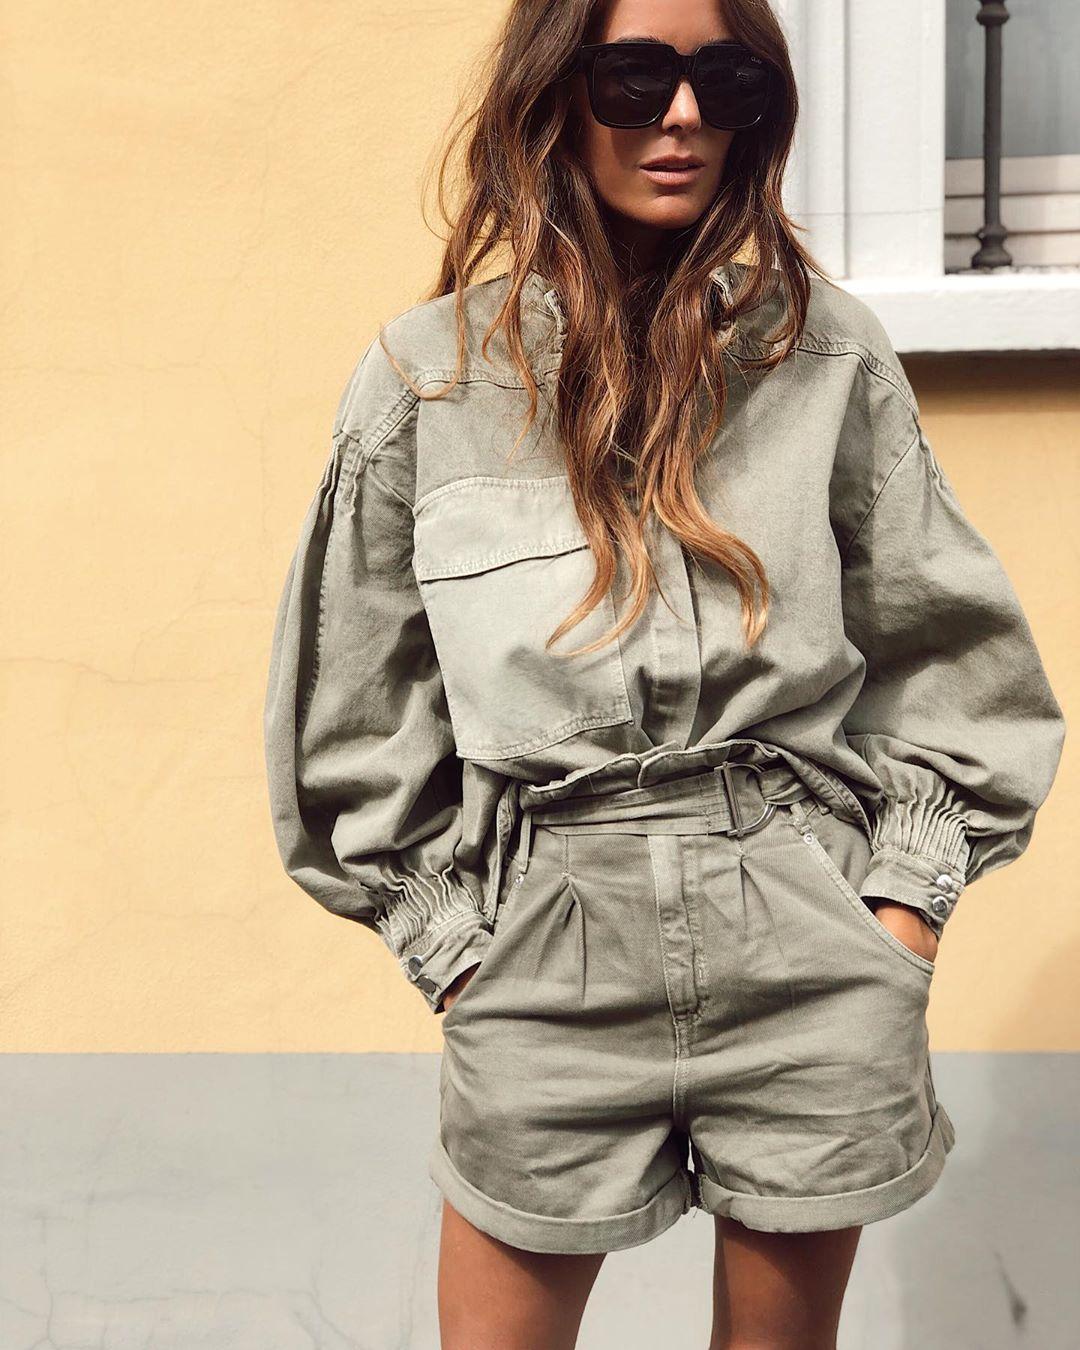 pleated shirt and pocket de Zara sur mariatilve